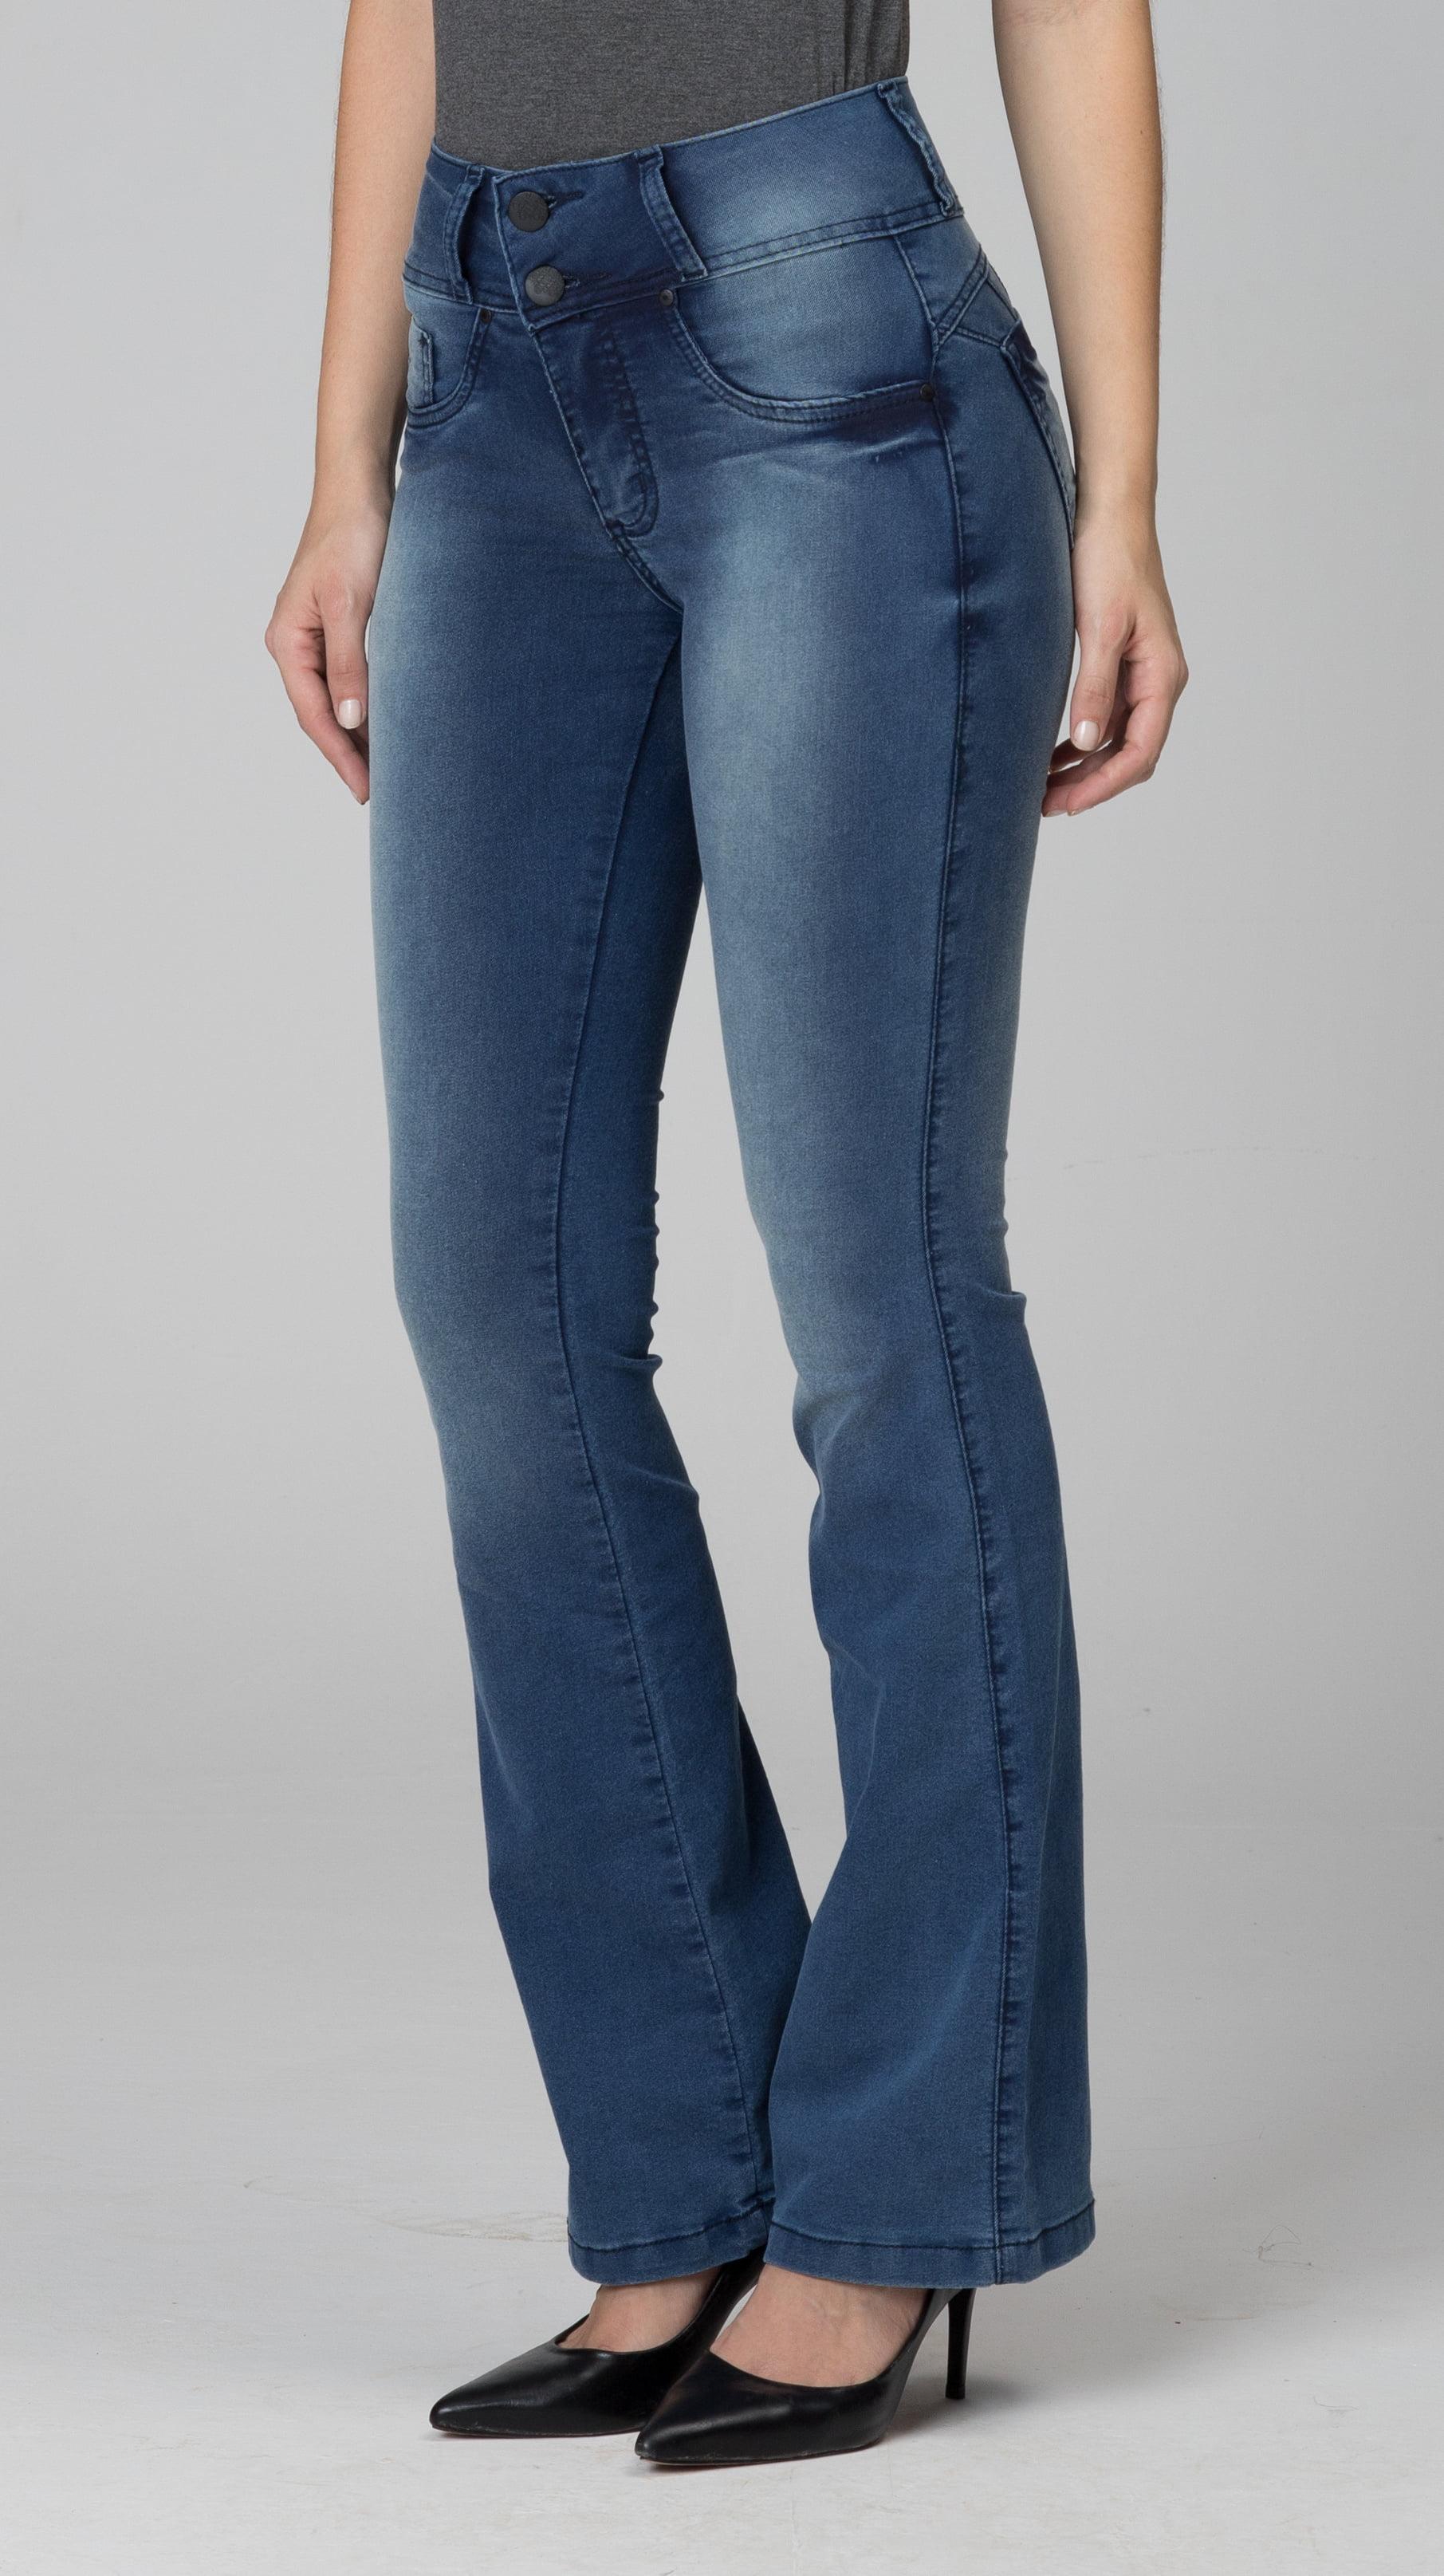 Calça Flare Jeans Levanta Bumbum F2020470